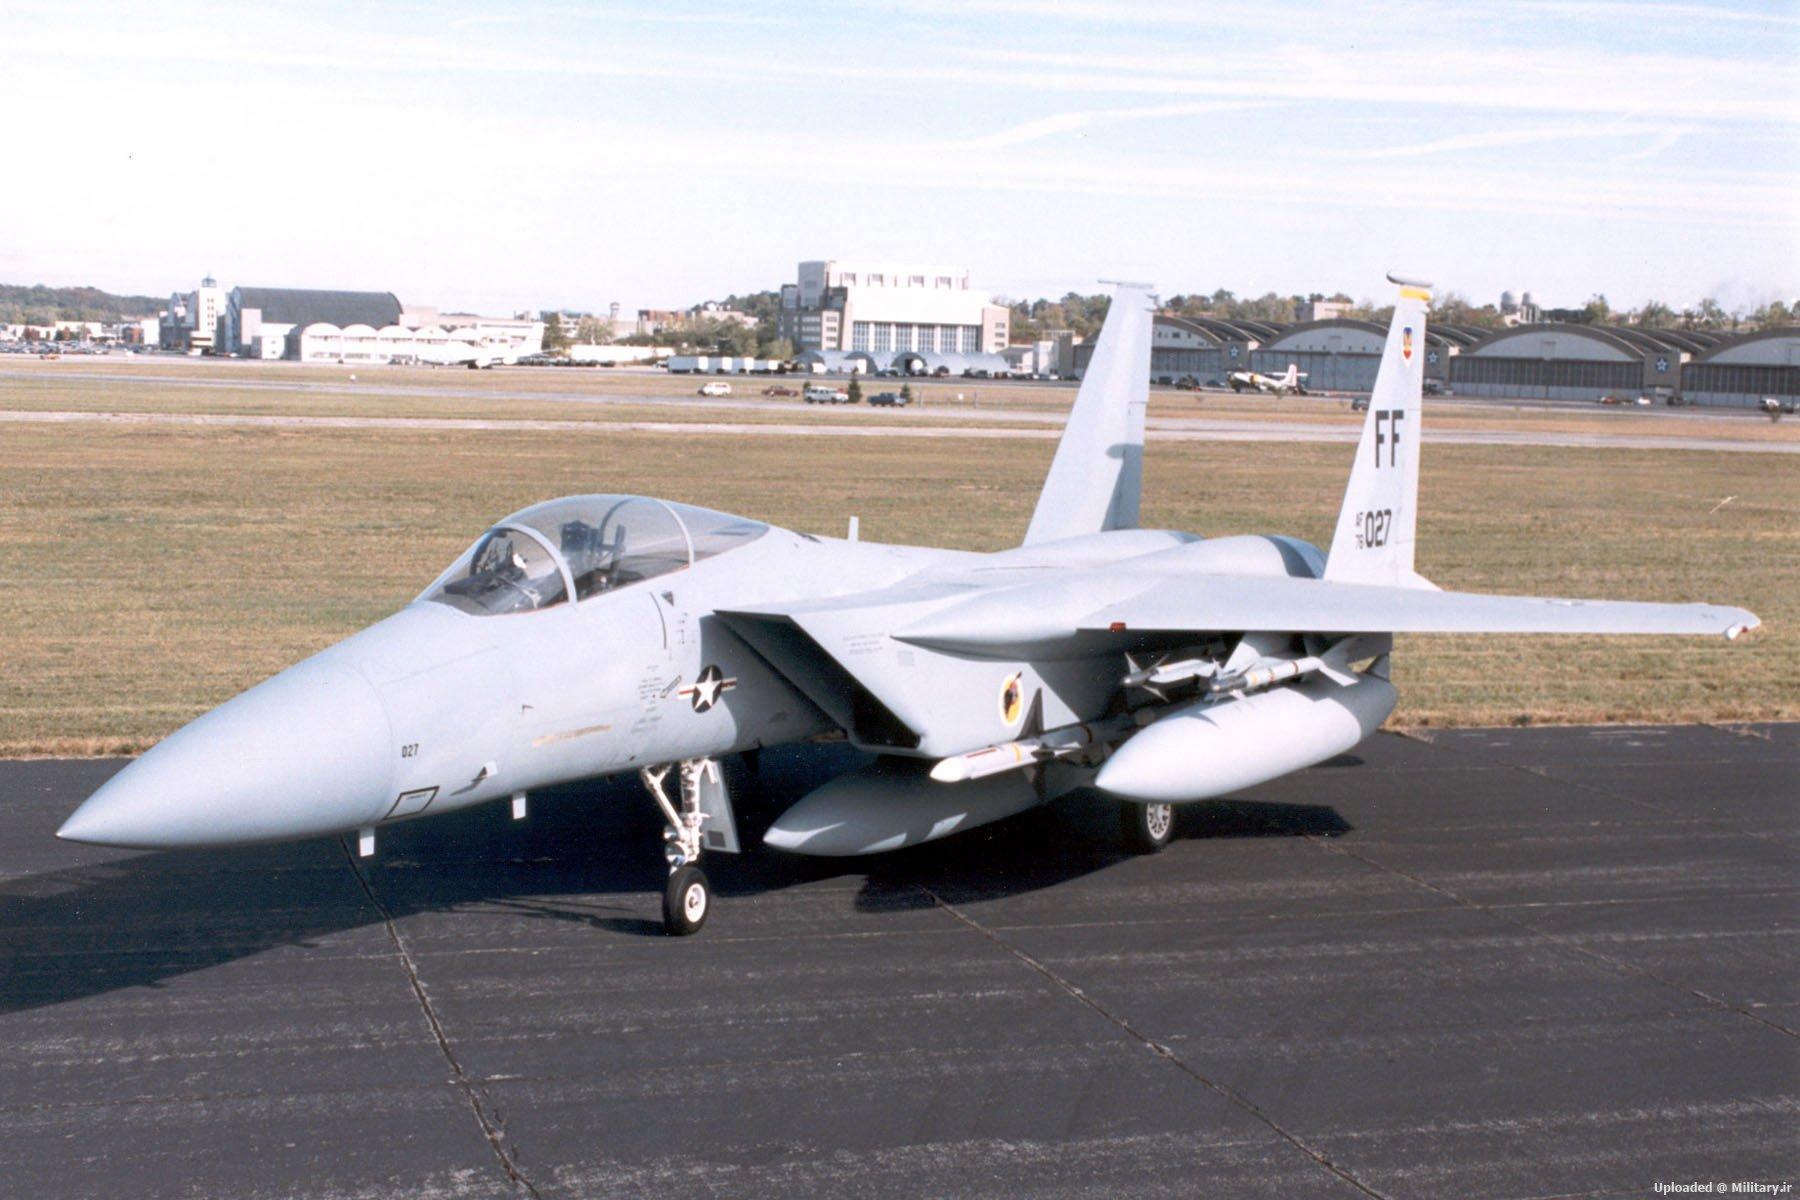 050321-F-1234P-005.JPG